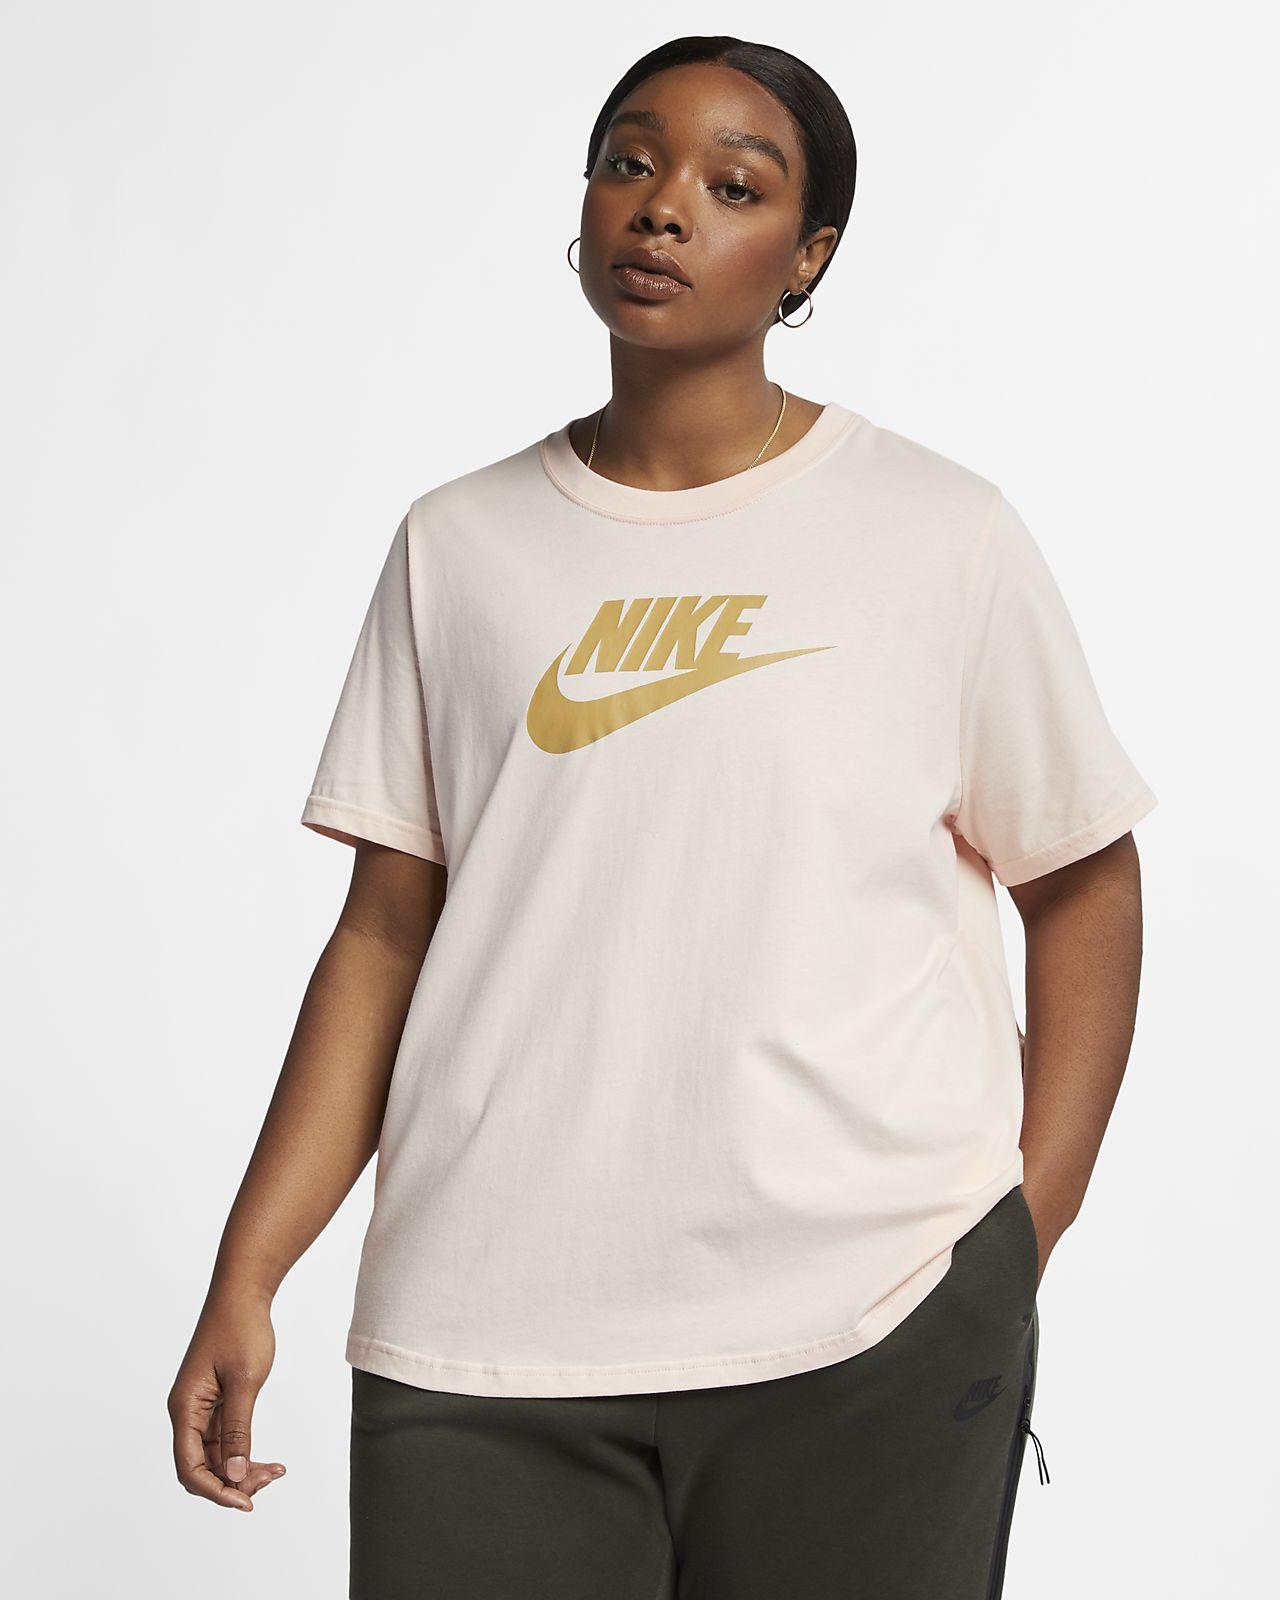 9e657c94fee Tee Nike grande Pour Sportswear Taille Femme Essential Shirt T4qTUAw